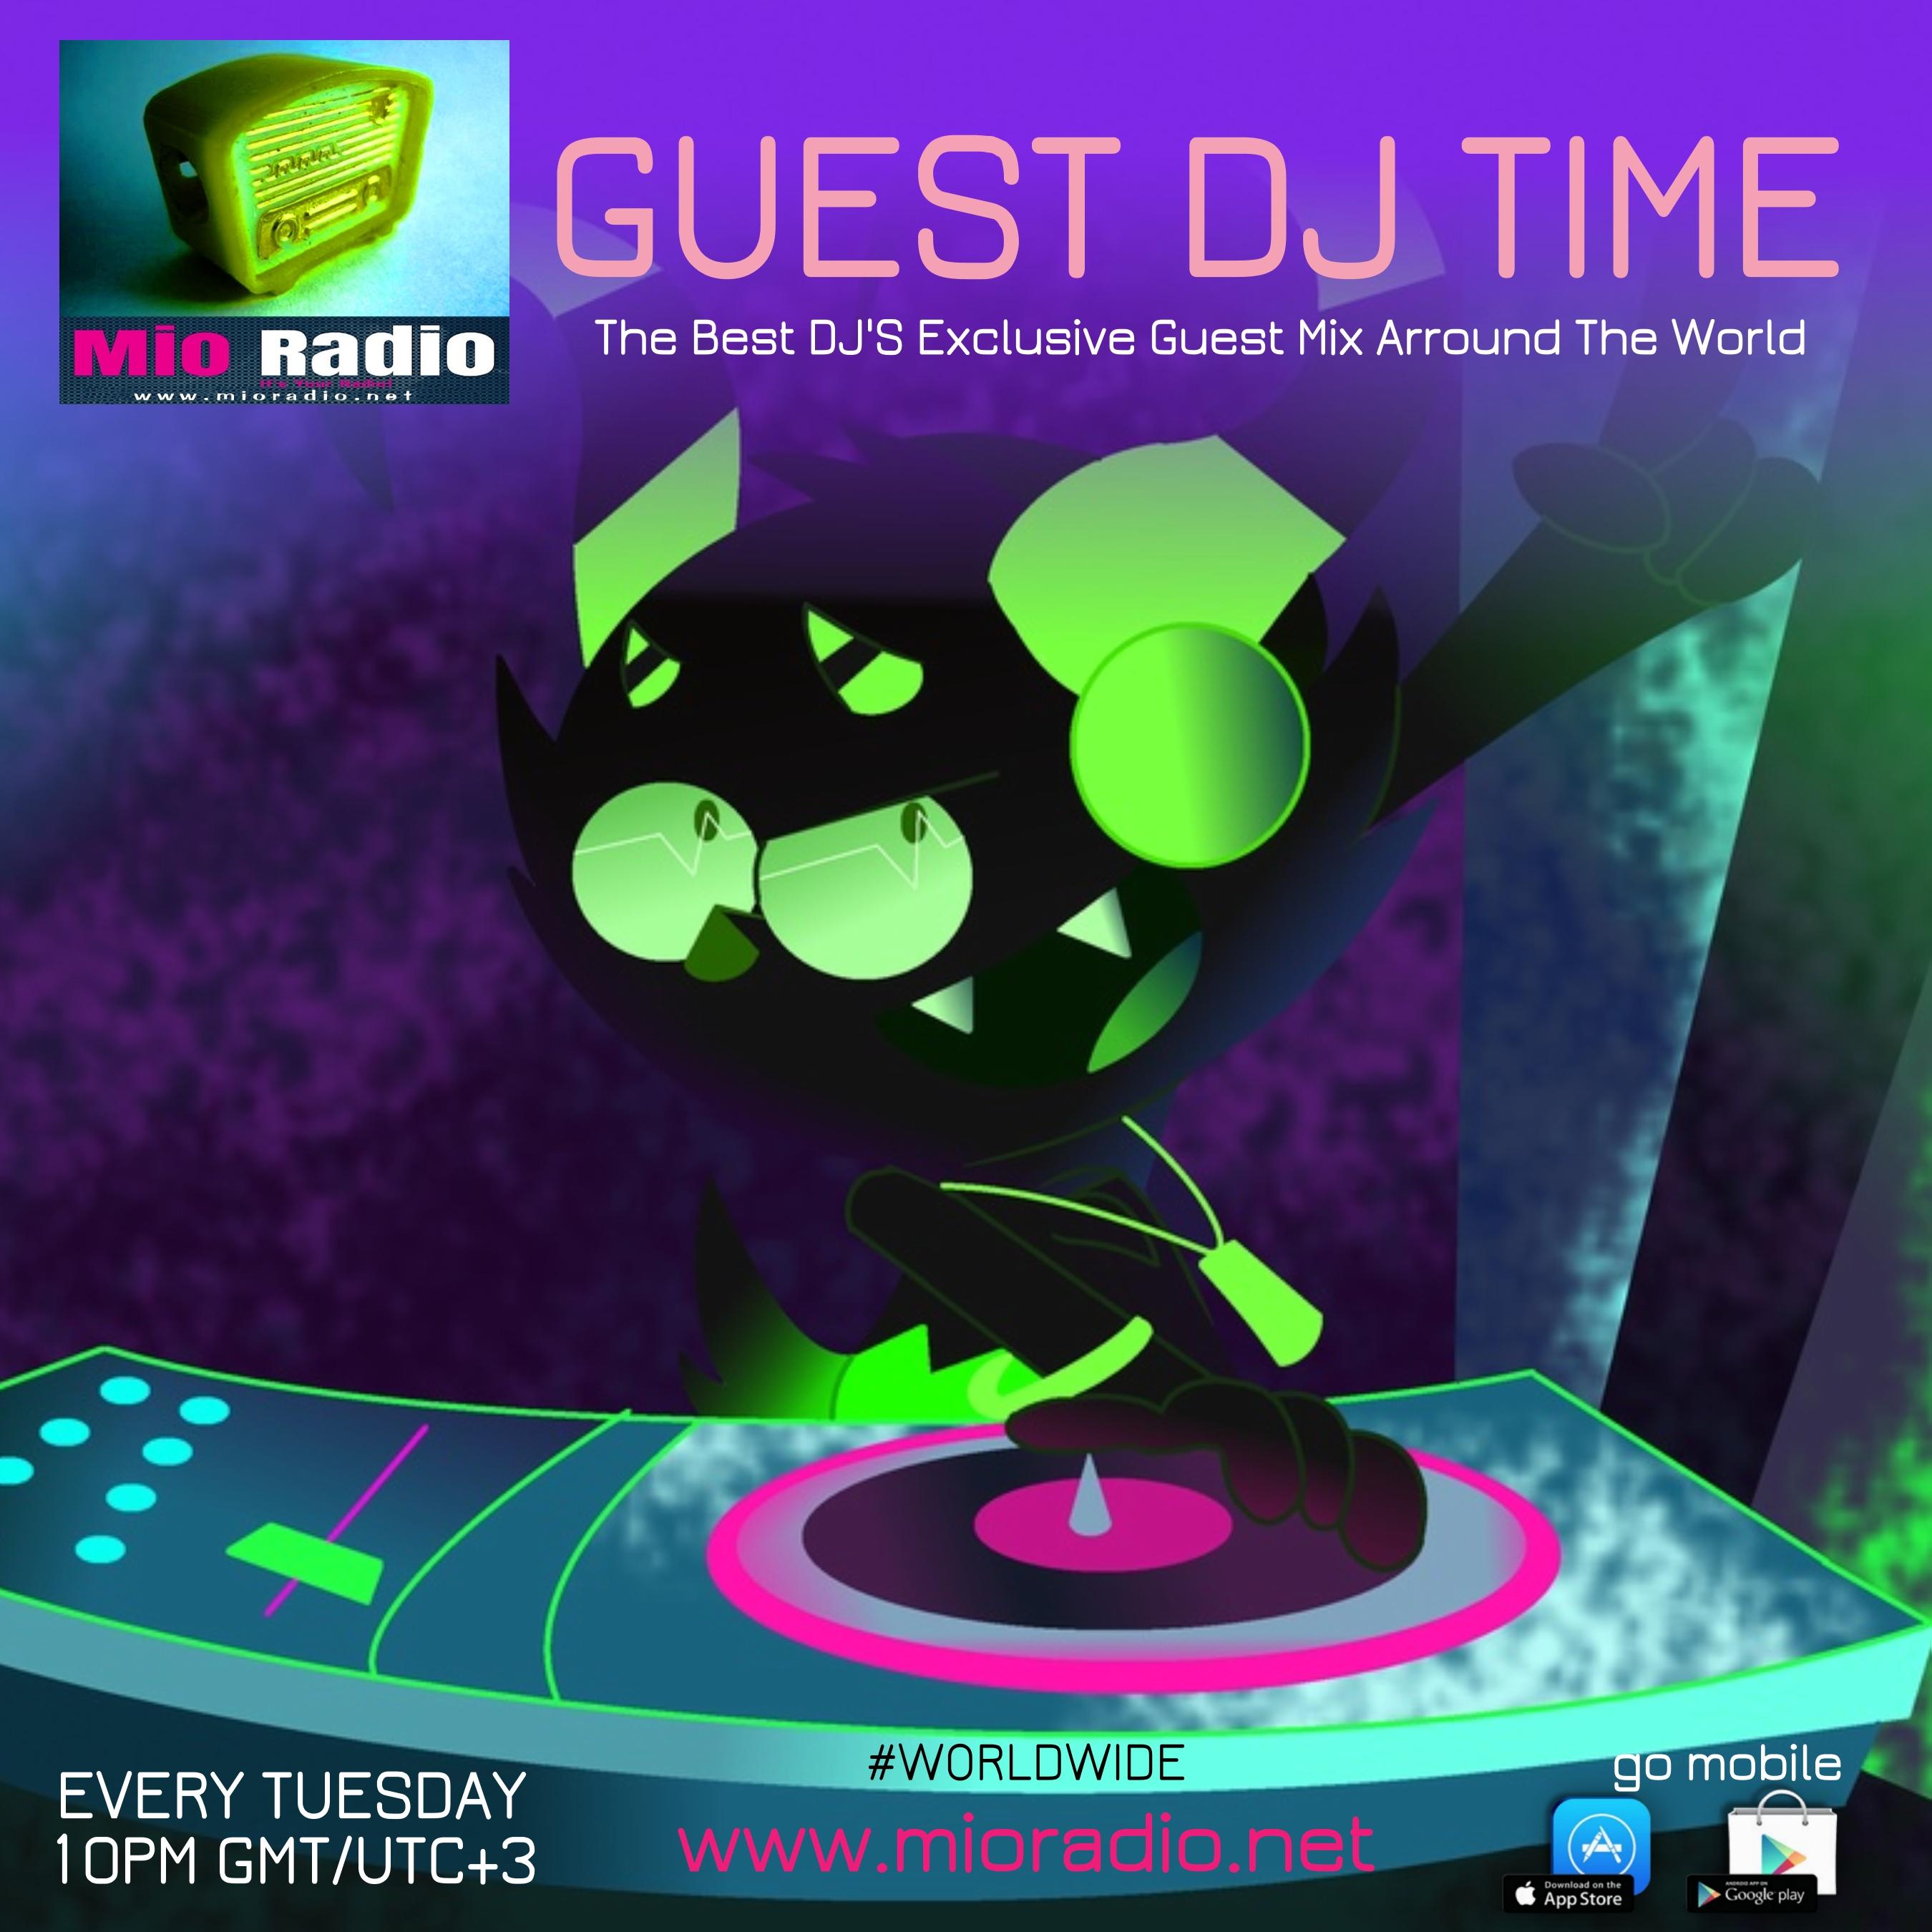 Mio Radio - GUEST DJ TIME SHOW